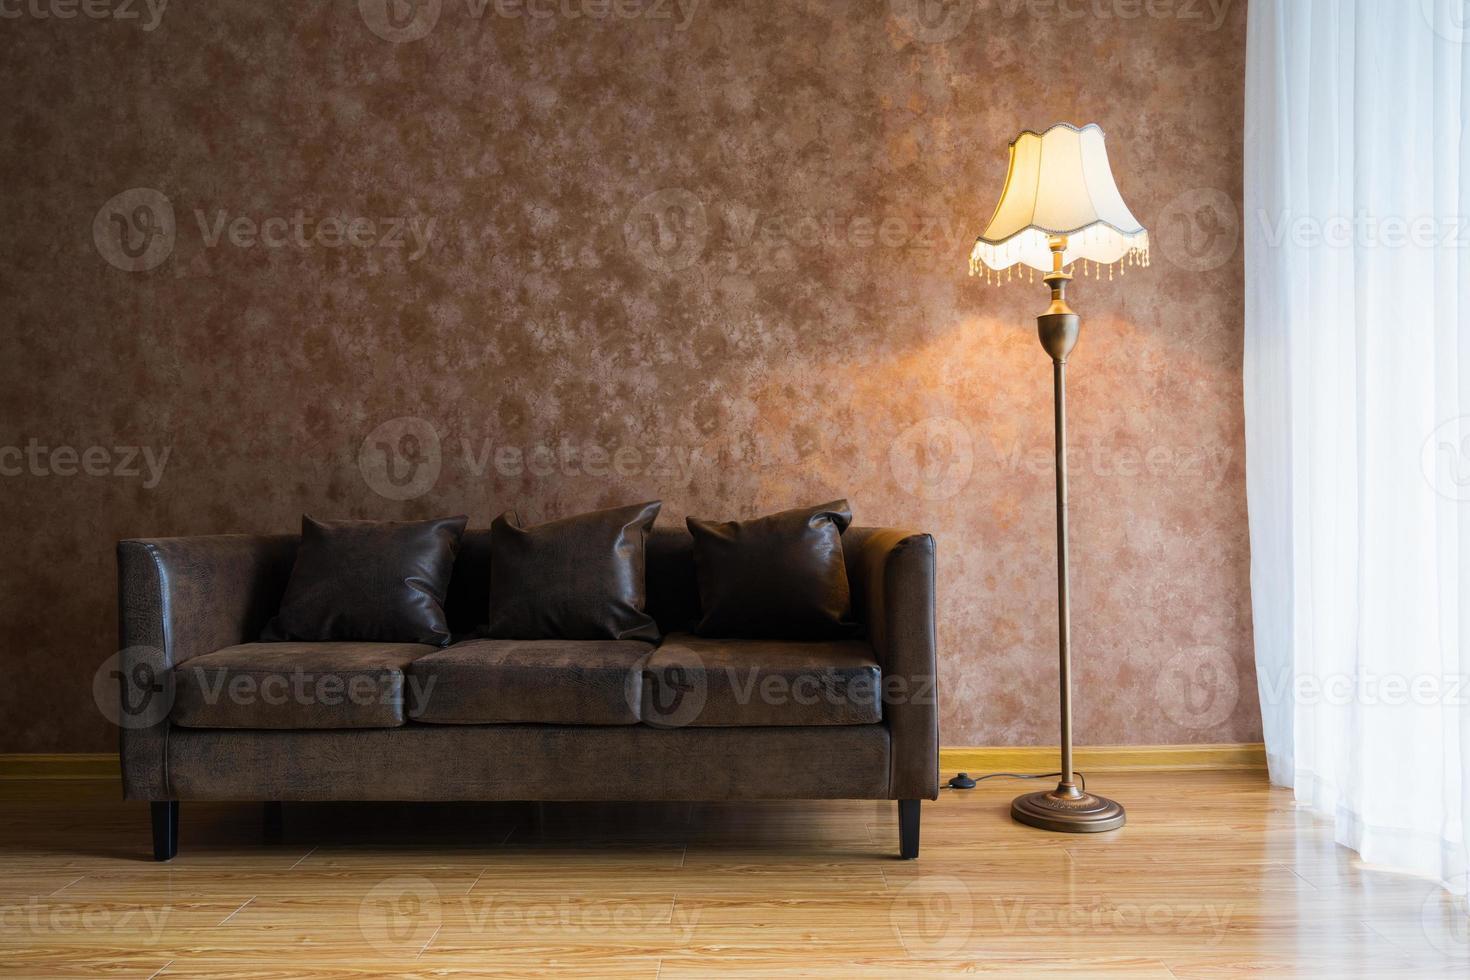 decoración de interiores de casa moderna foto